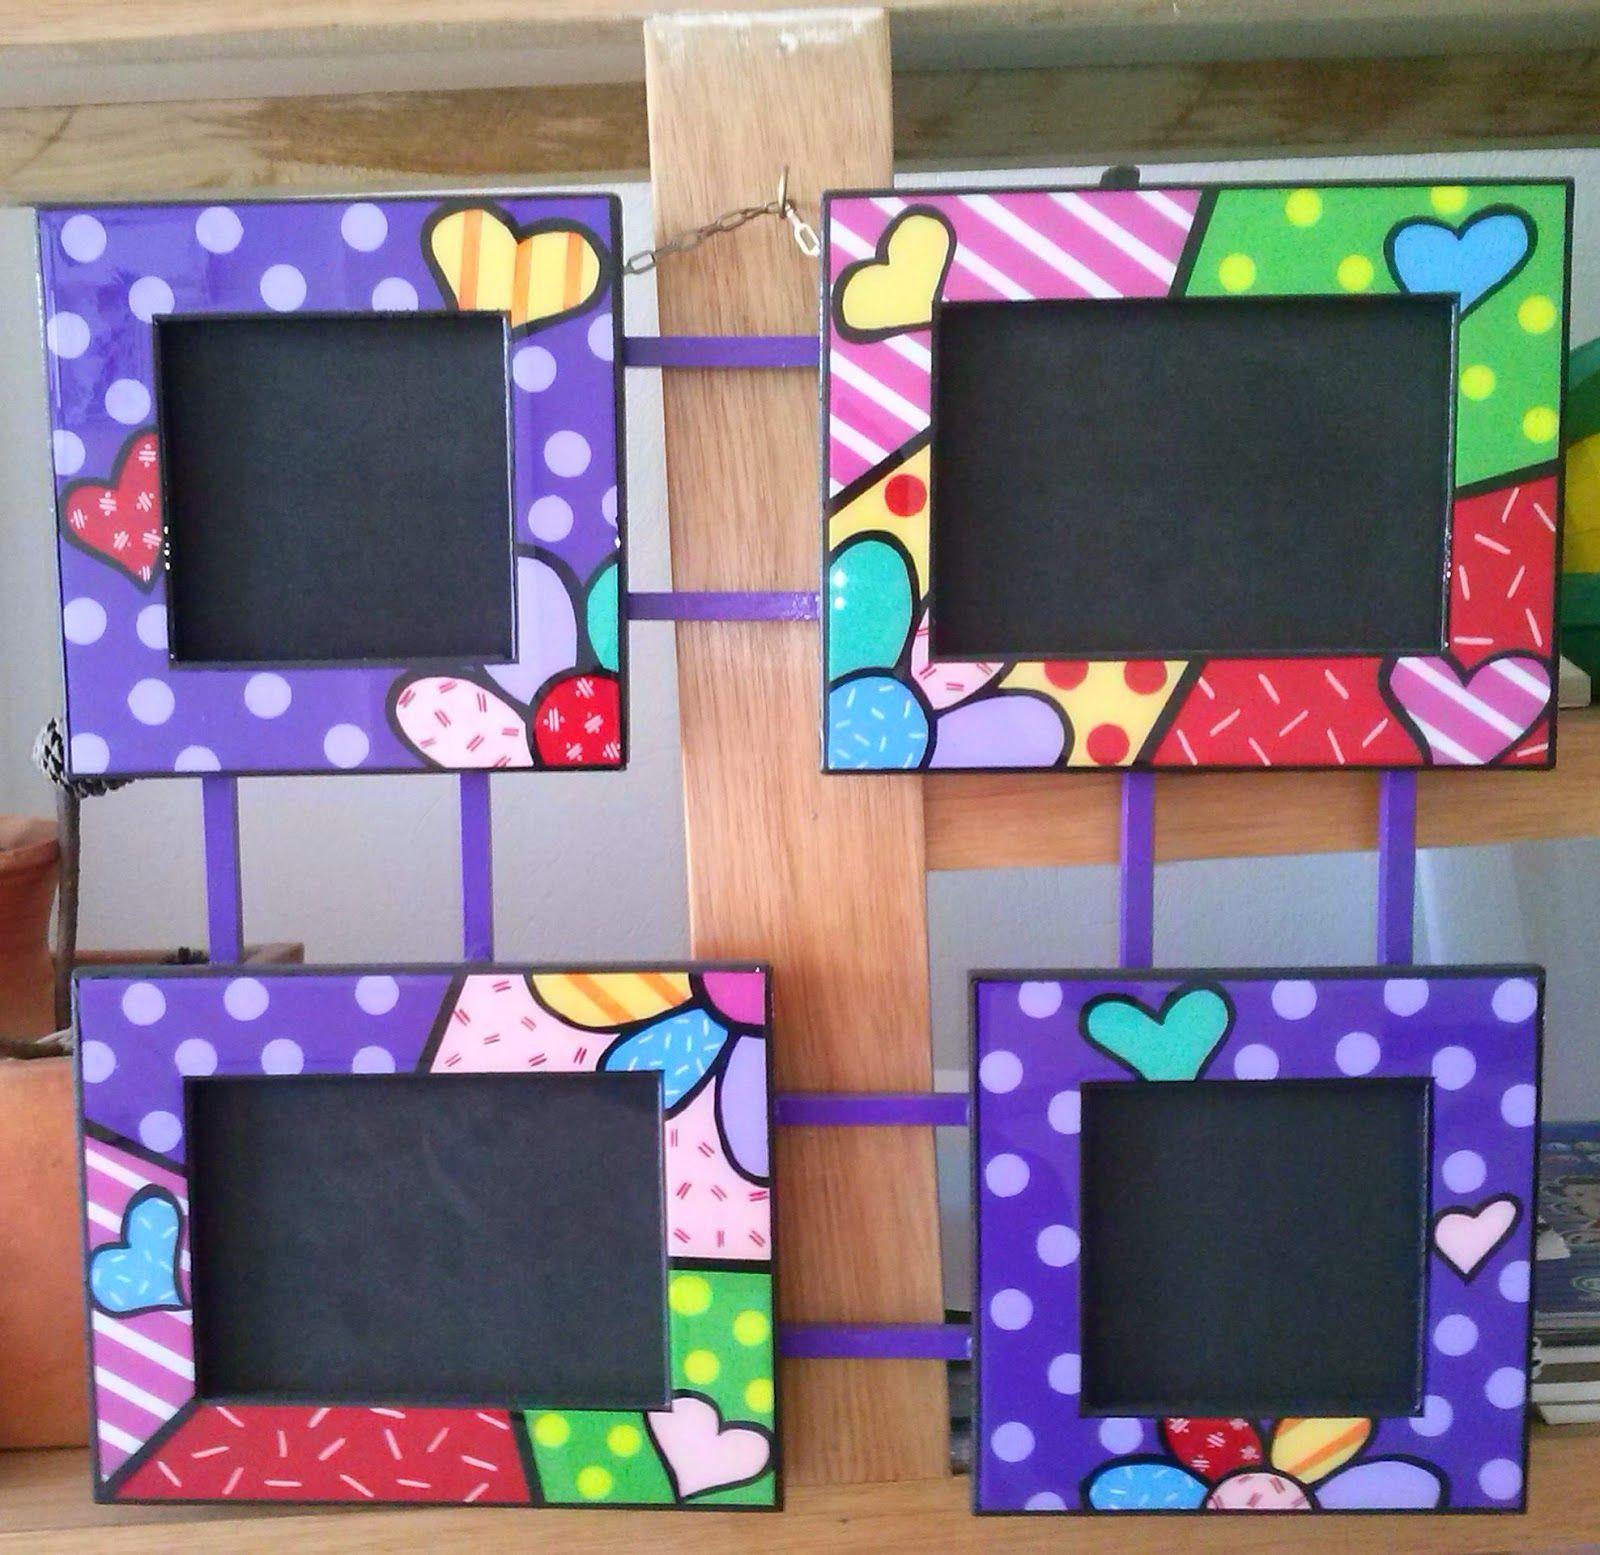 Posavasos 4 diseños diferentes de gustav klimt en caja de regalo